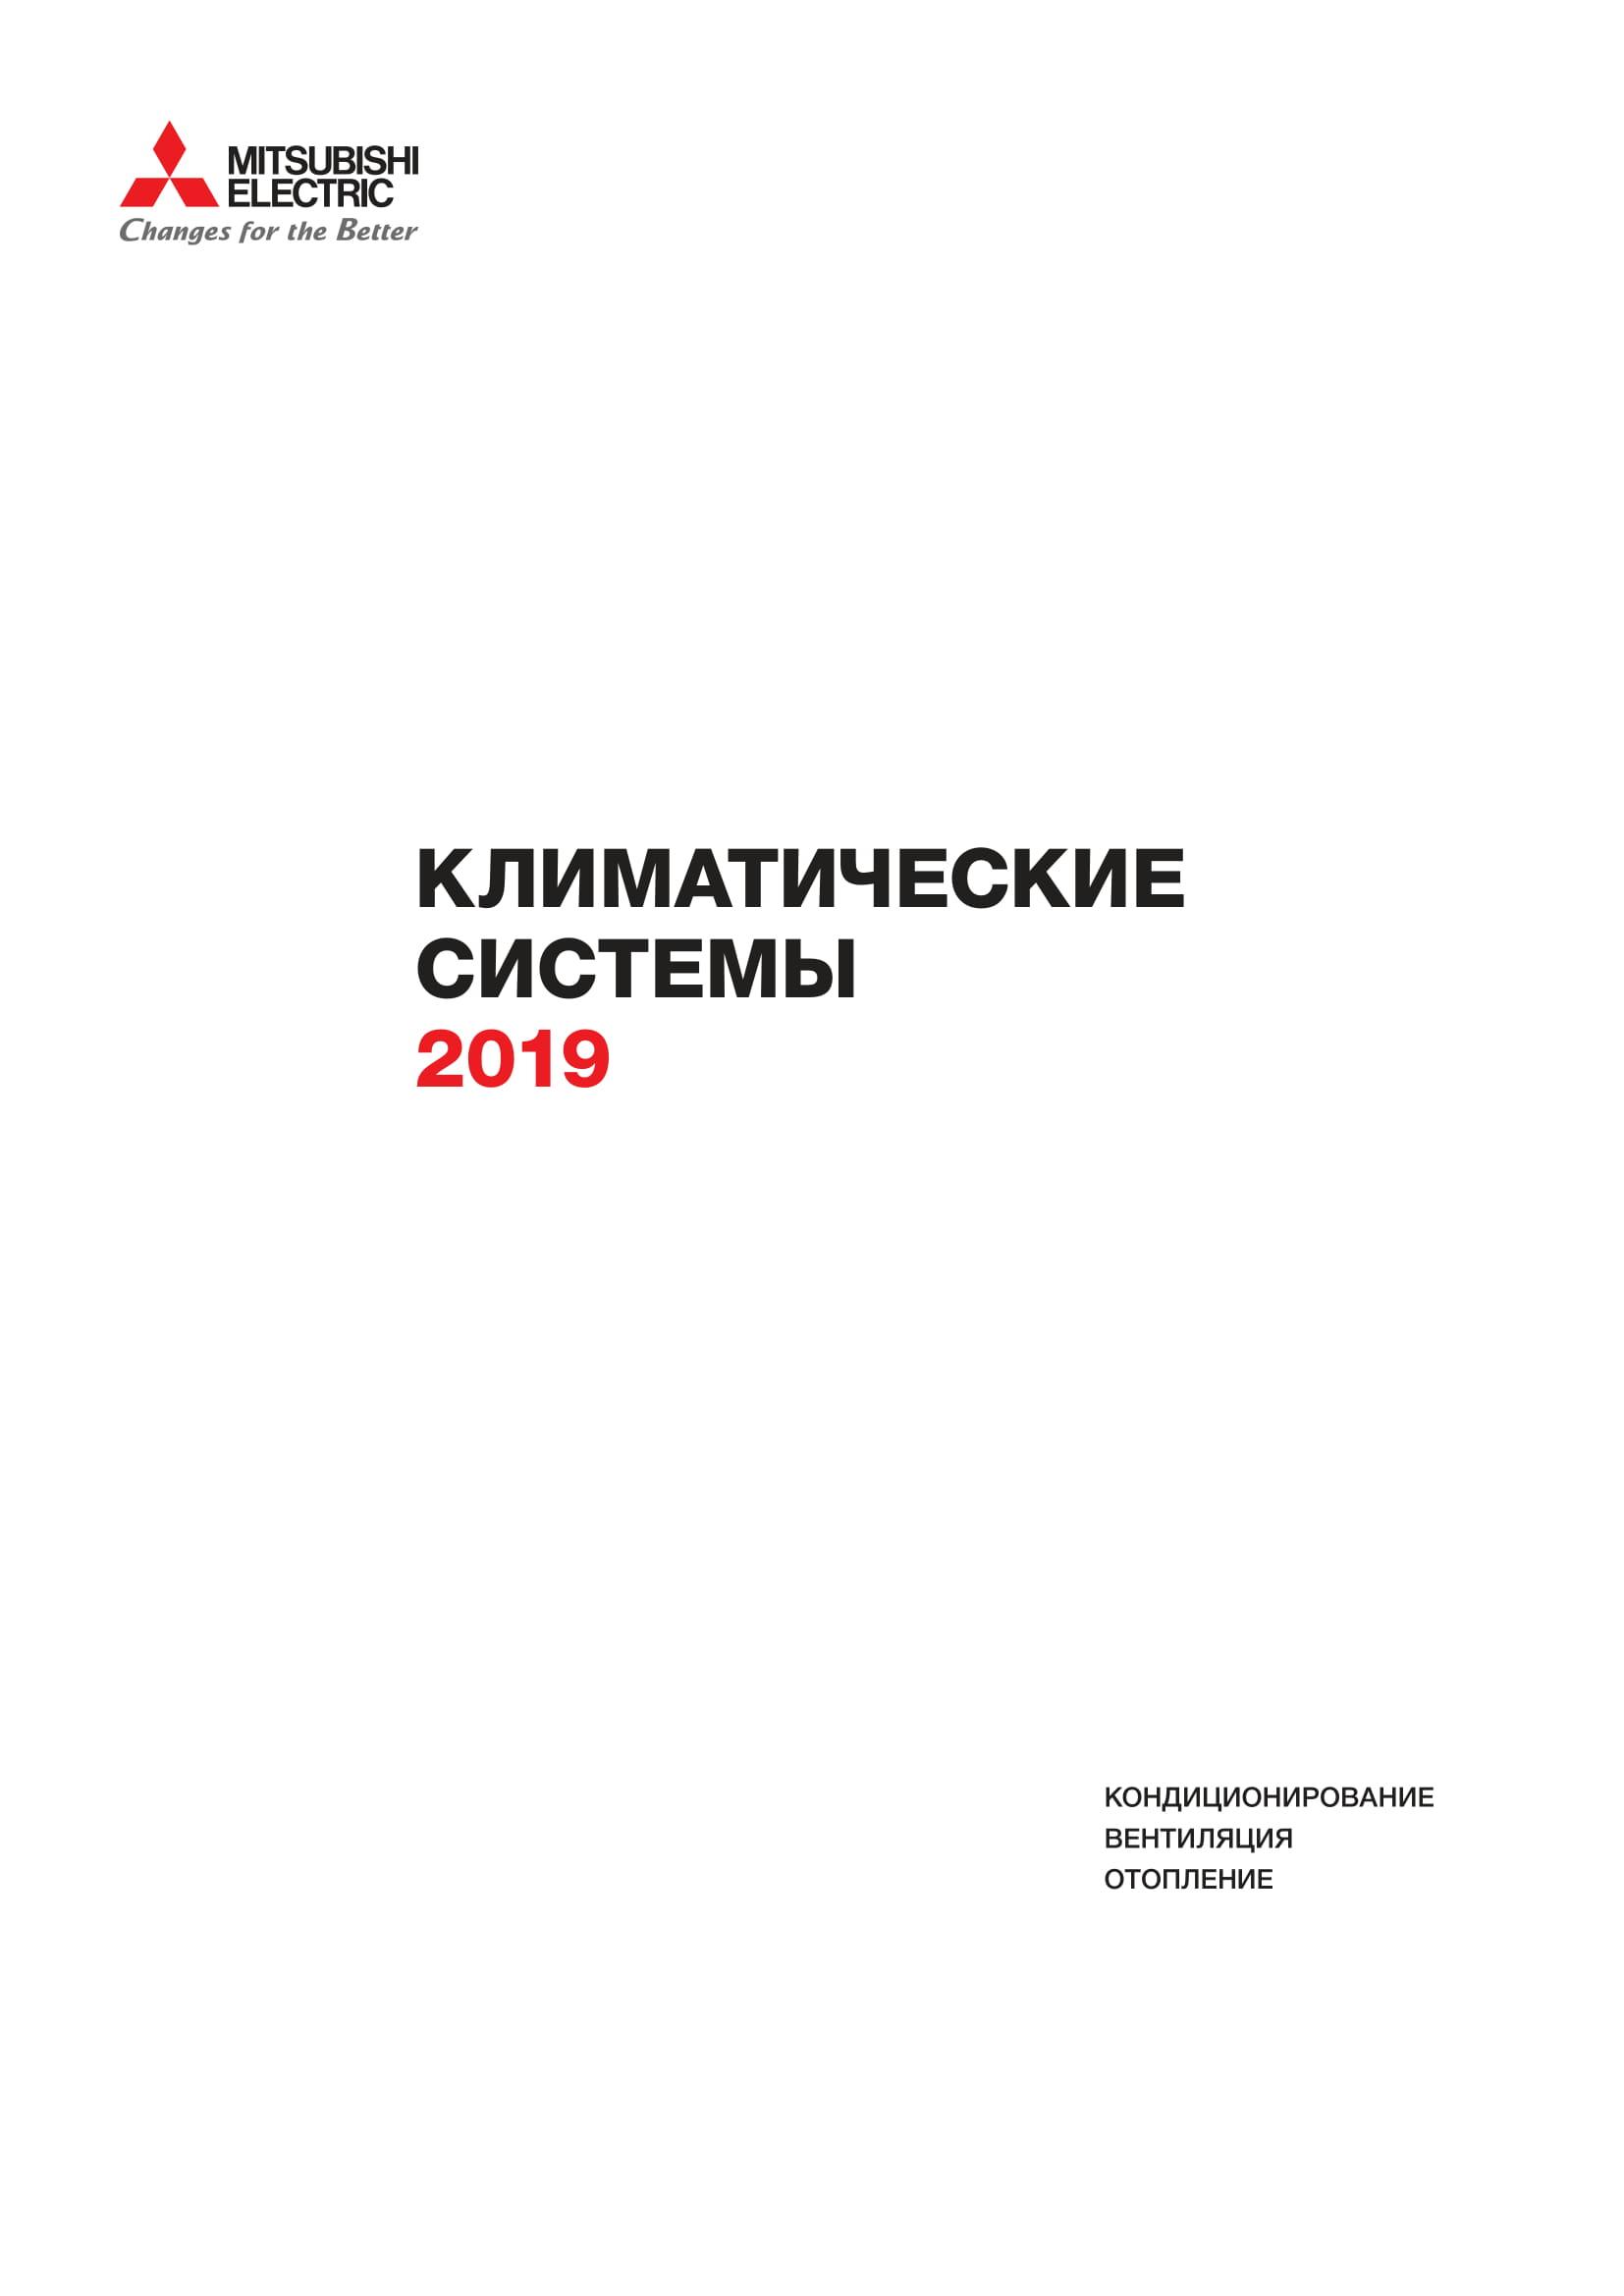 каталог Mitsubishi Electric 2019